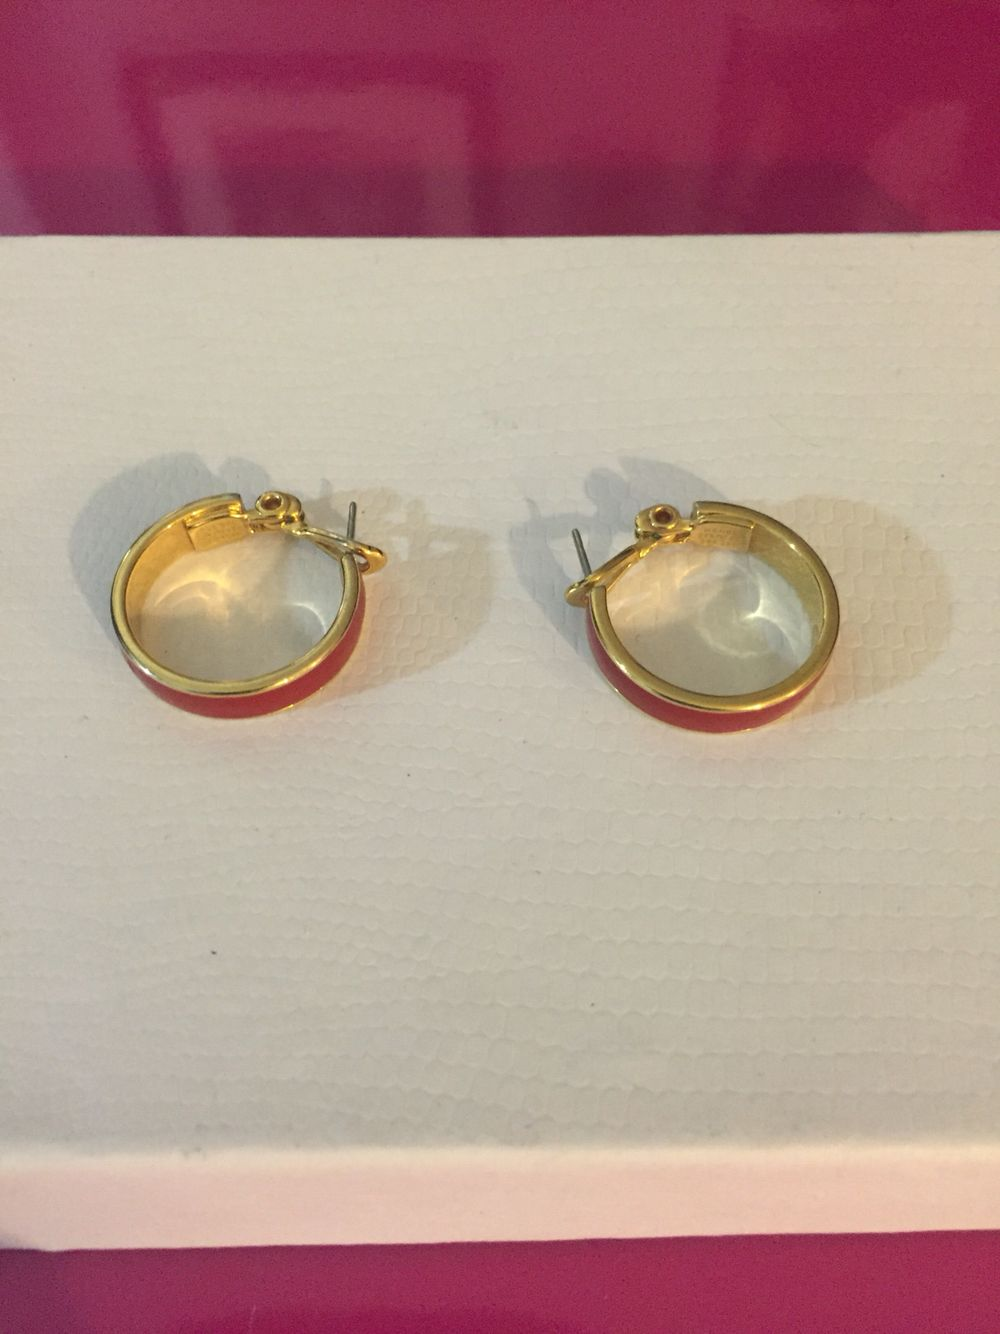 Gold Tone Red Enamel Hoop Earrings By Monet My Personal